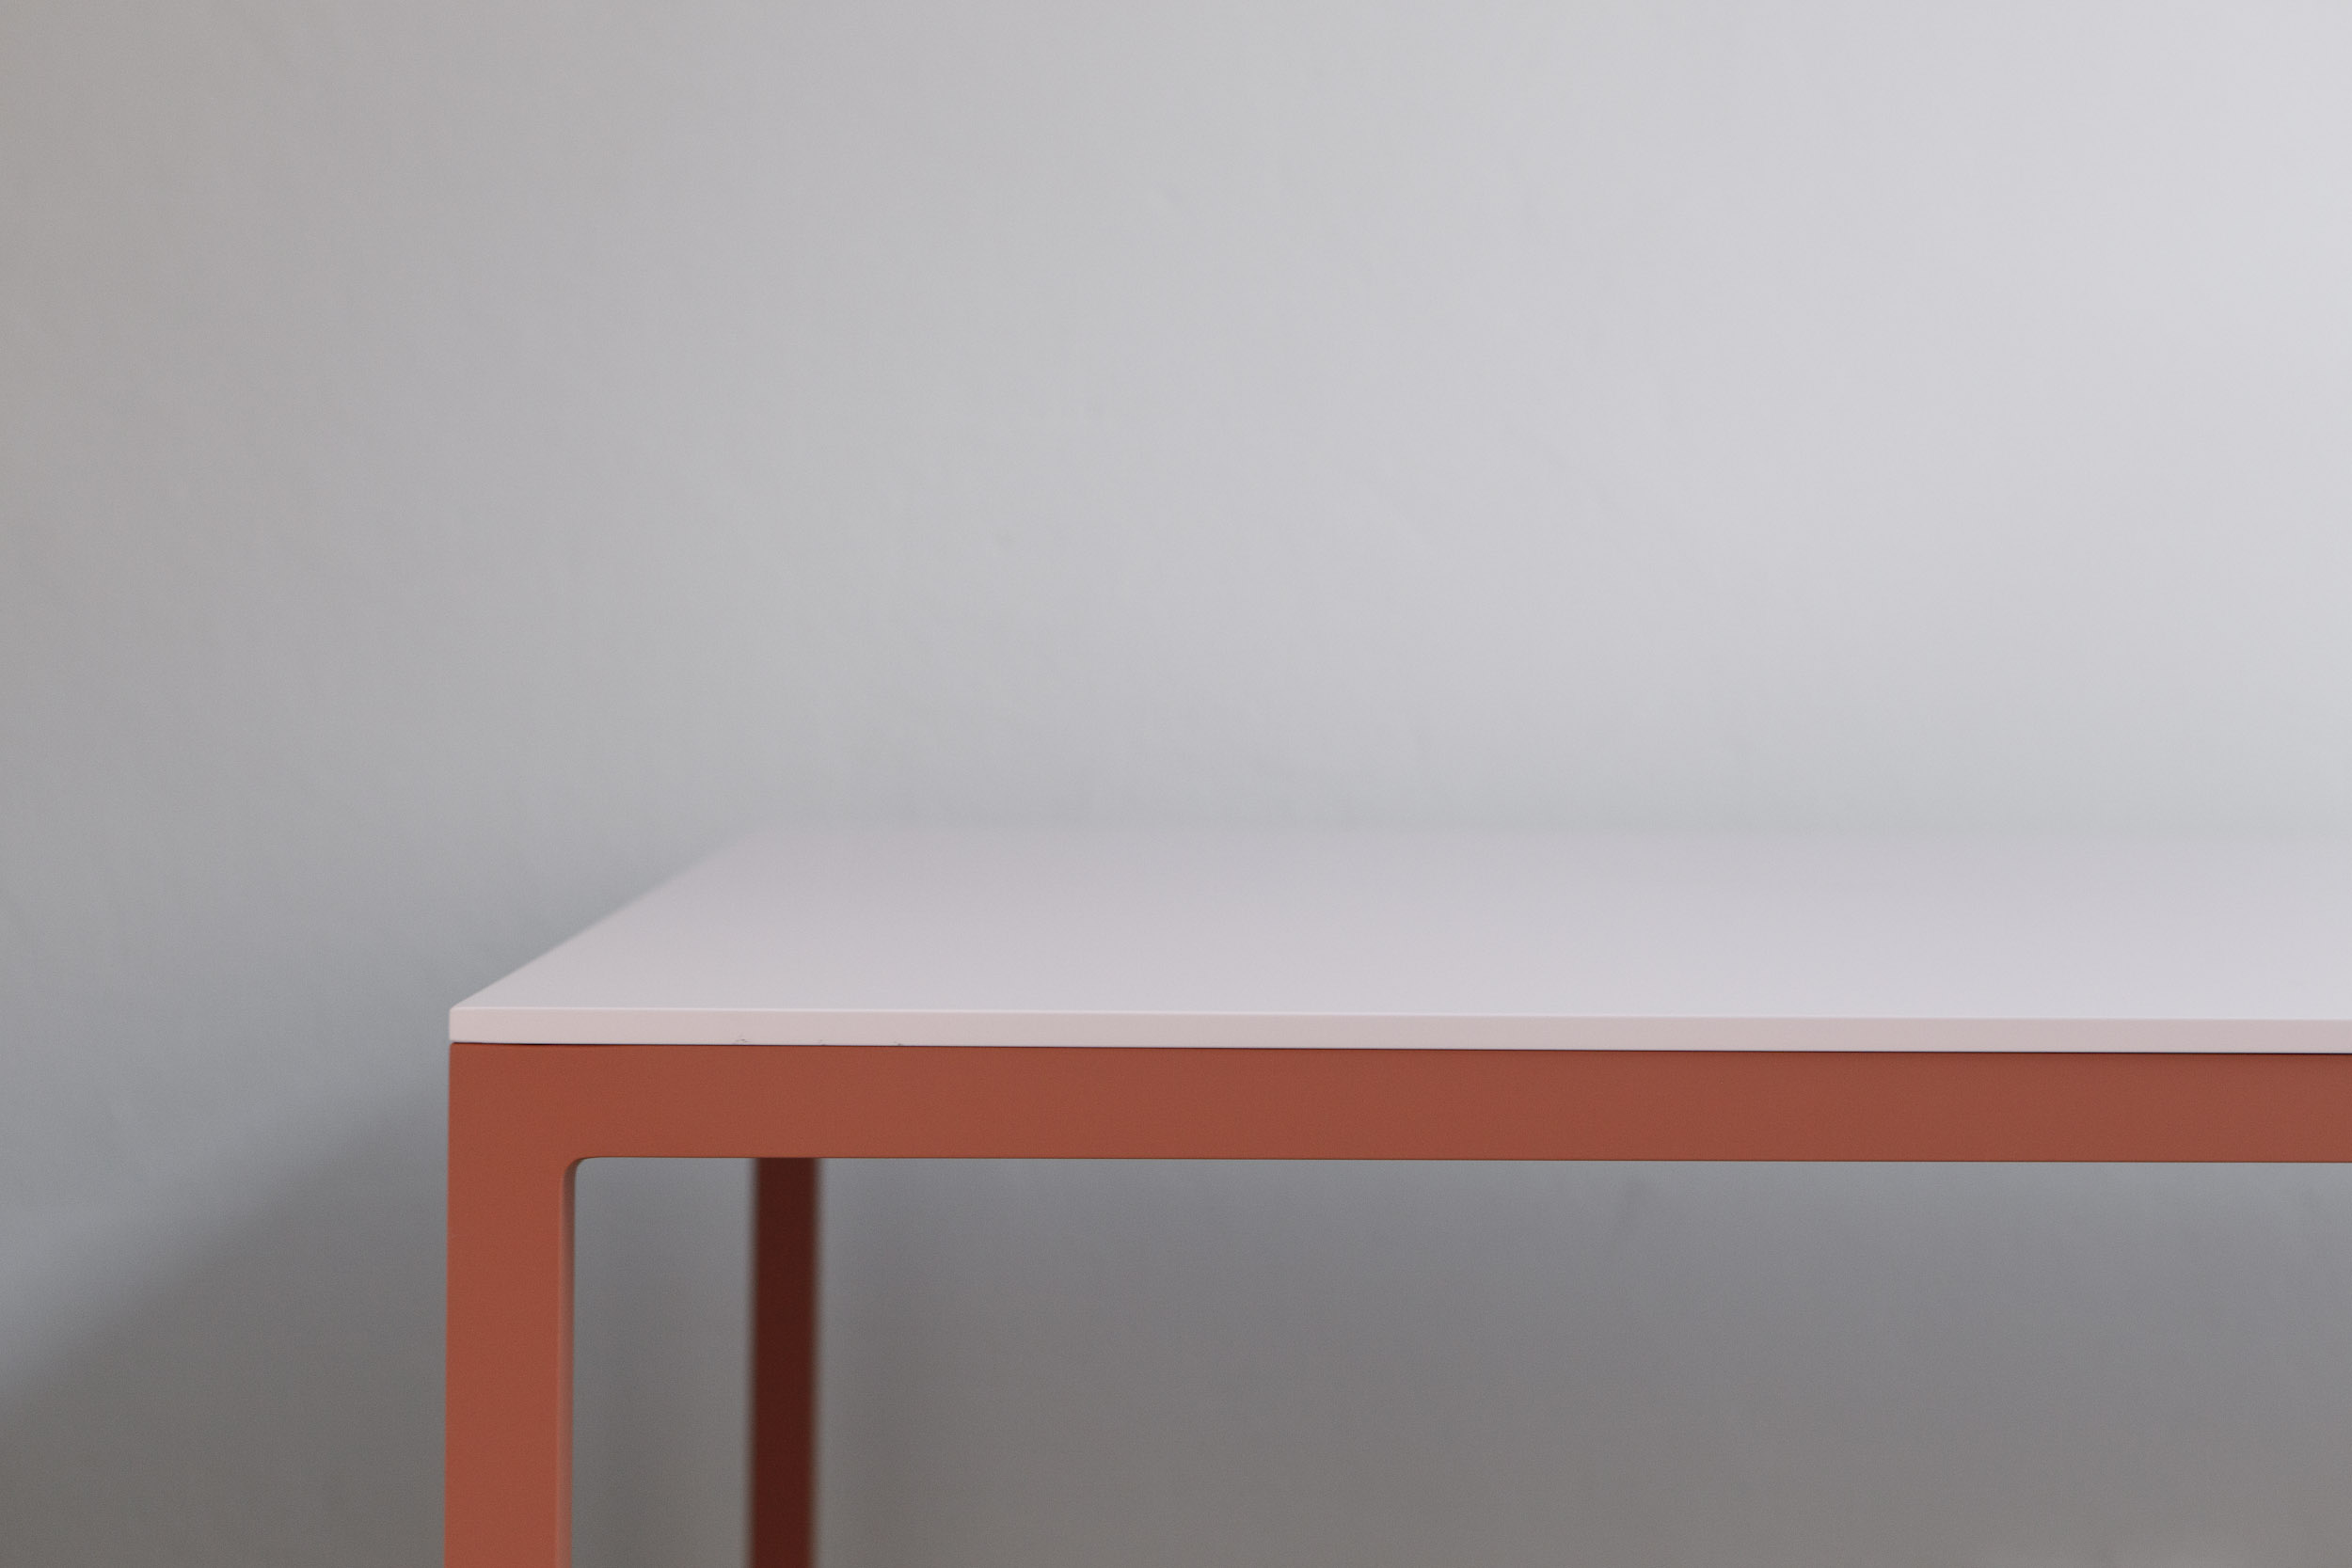 Table-TIB-colored-8149.jpg